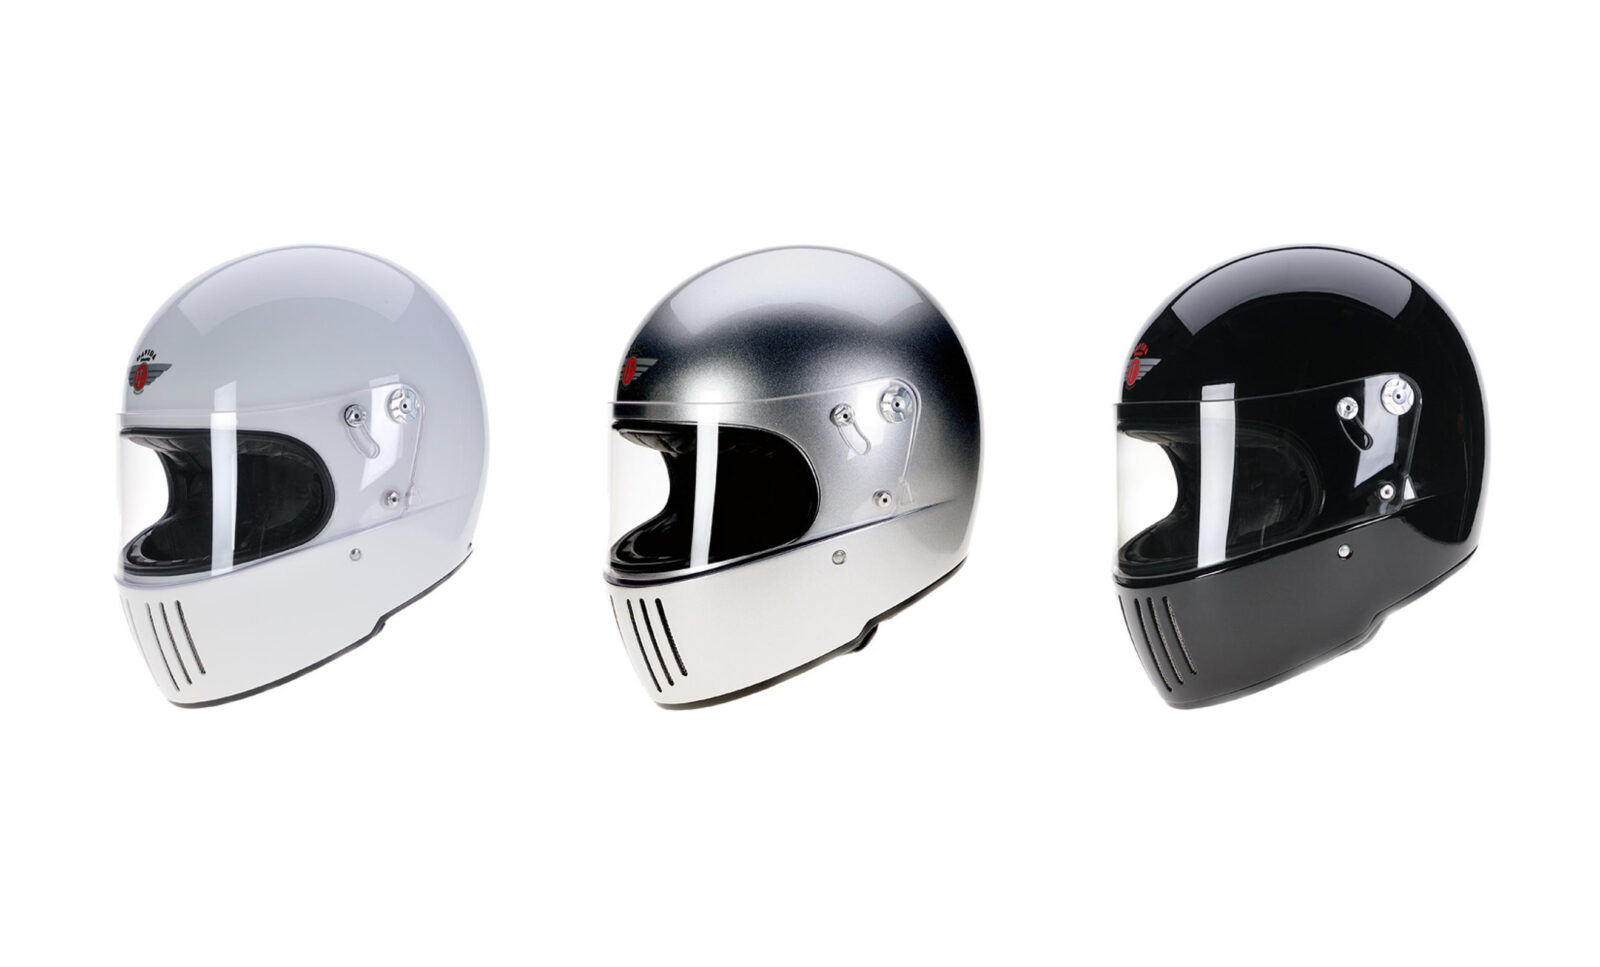 The Davida Koura Full Face Motorcycle Helmet - 100% Made In Britain